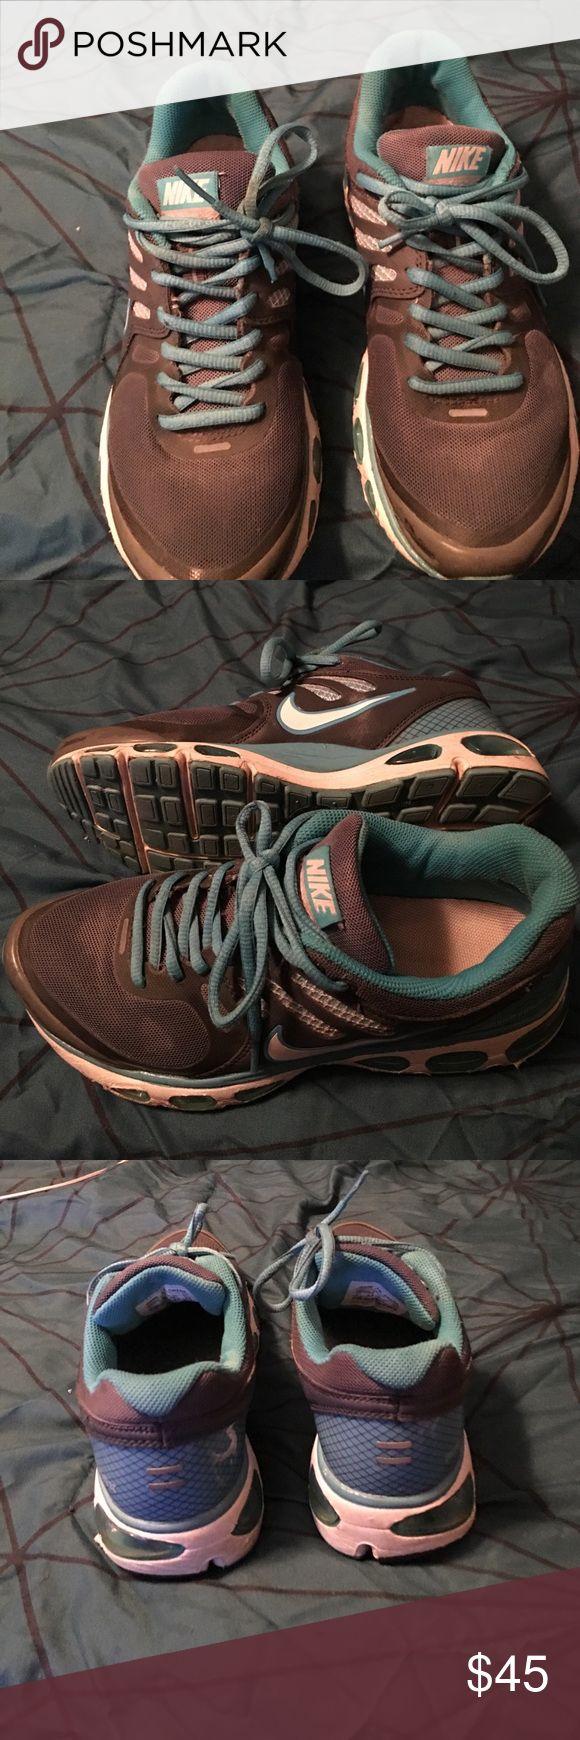 Women's Nike air tailwind size 7 Minimal wear, smoke free home Nike Shoes Sneakers